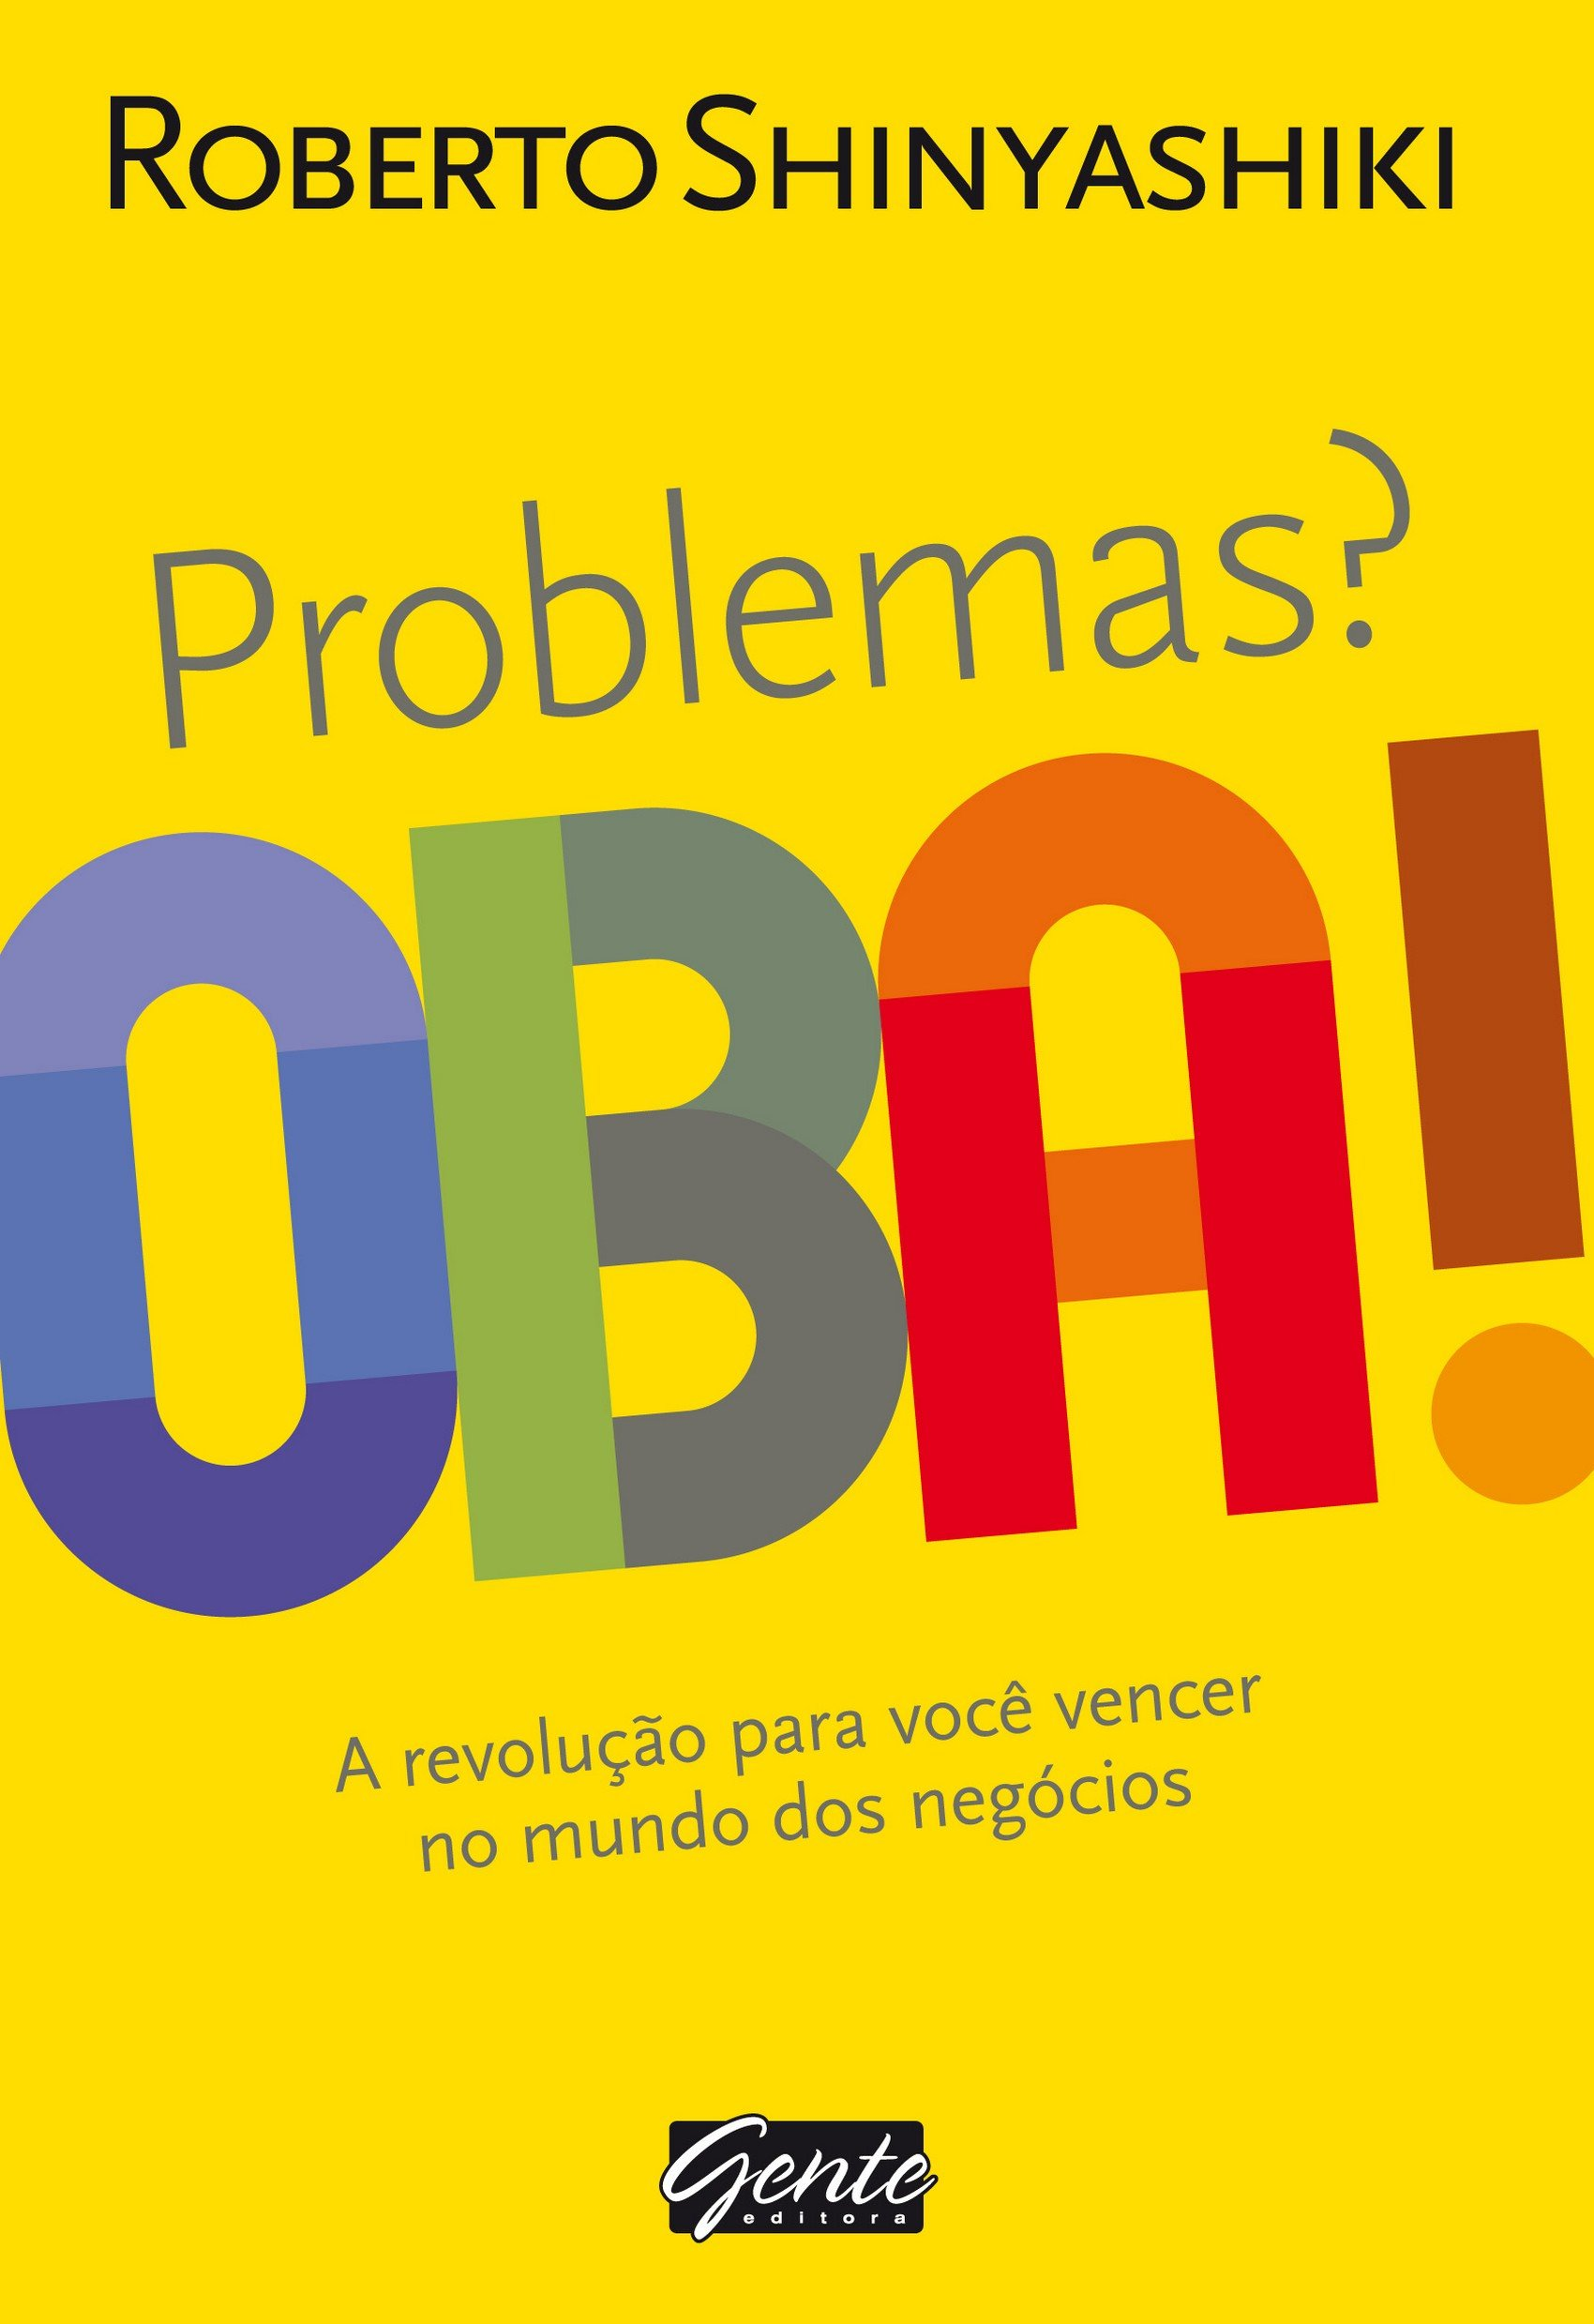 Problemas? Oba! | Amazon.com.br